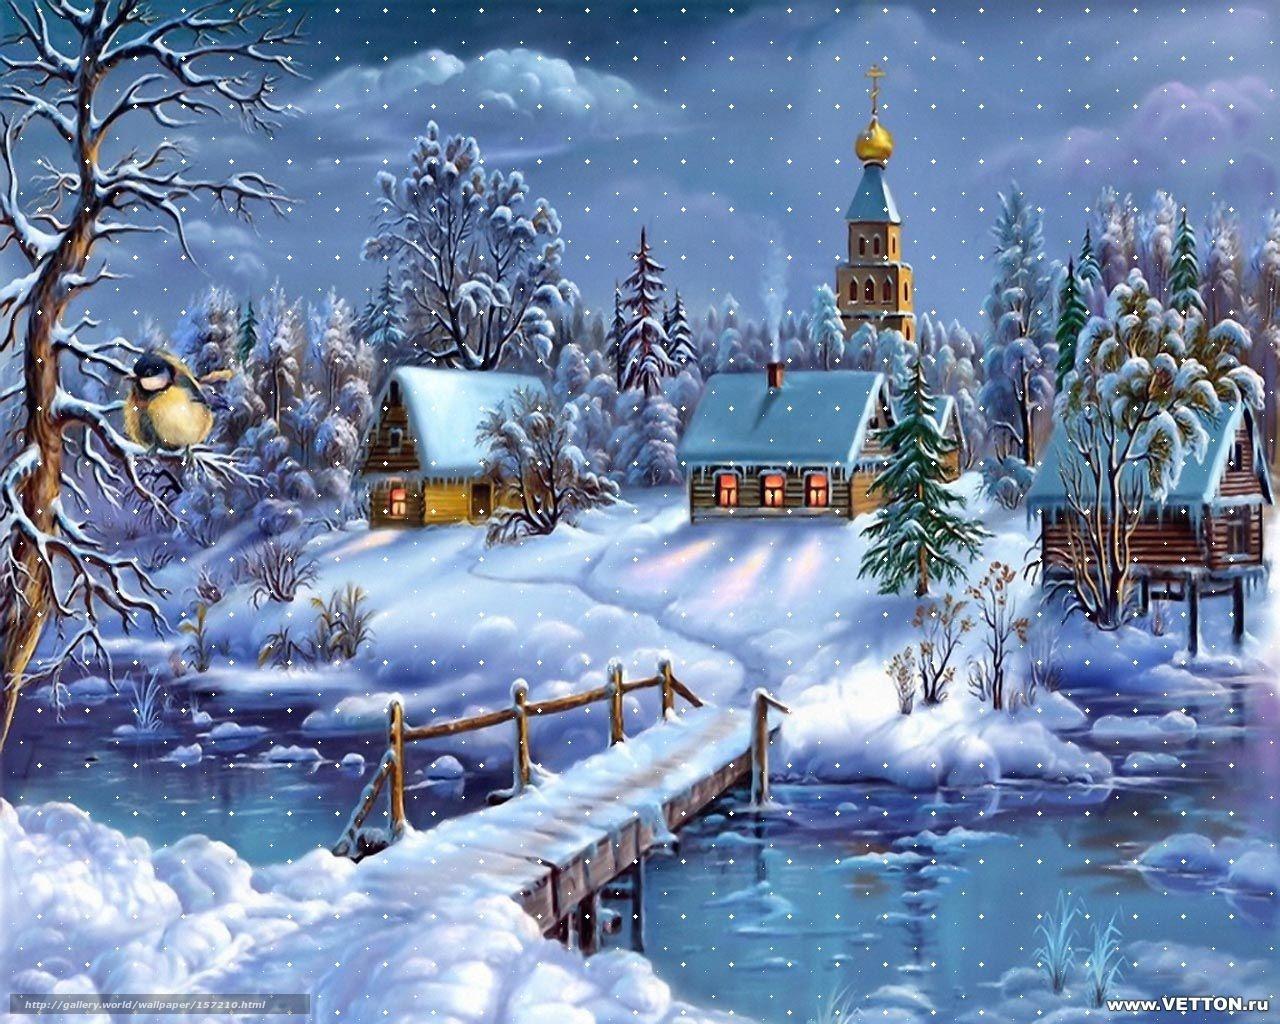 Ricerche correlate a Desktop gratis inverno 1280x1024